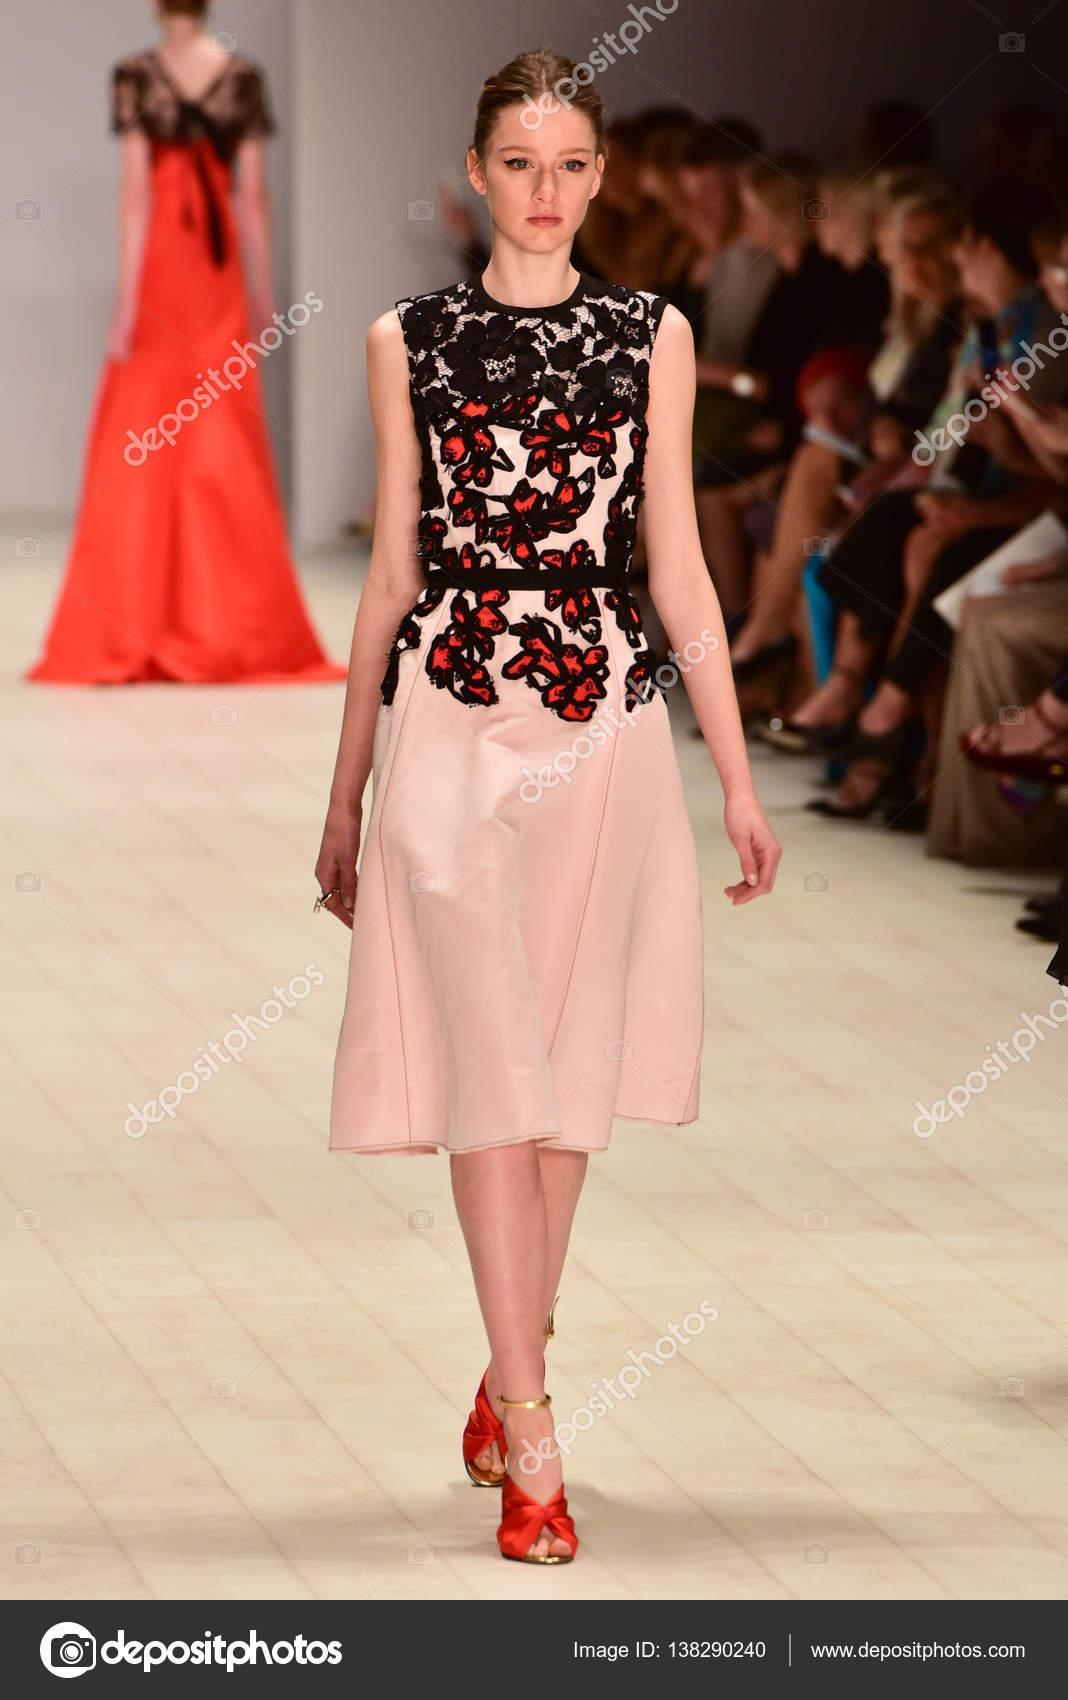 45da73369e3ee6 Oscar de la Renta fashion show – Stock Editorial Photo © mariematata ...